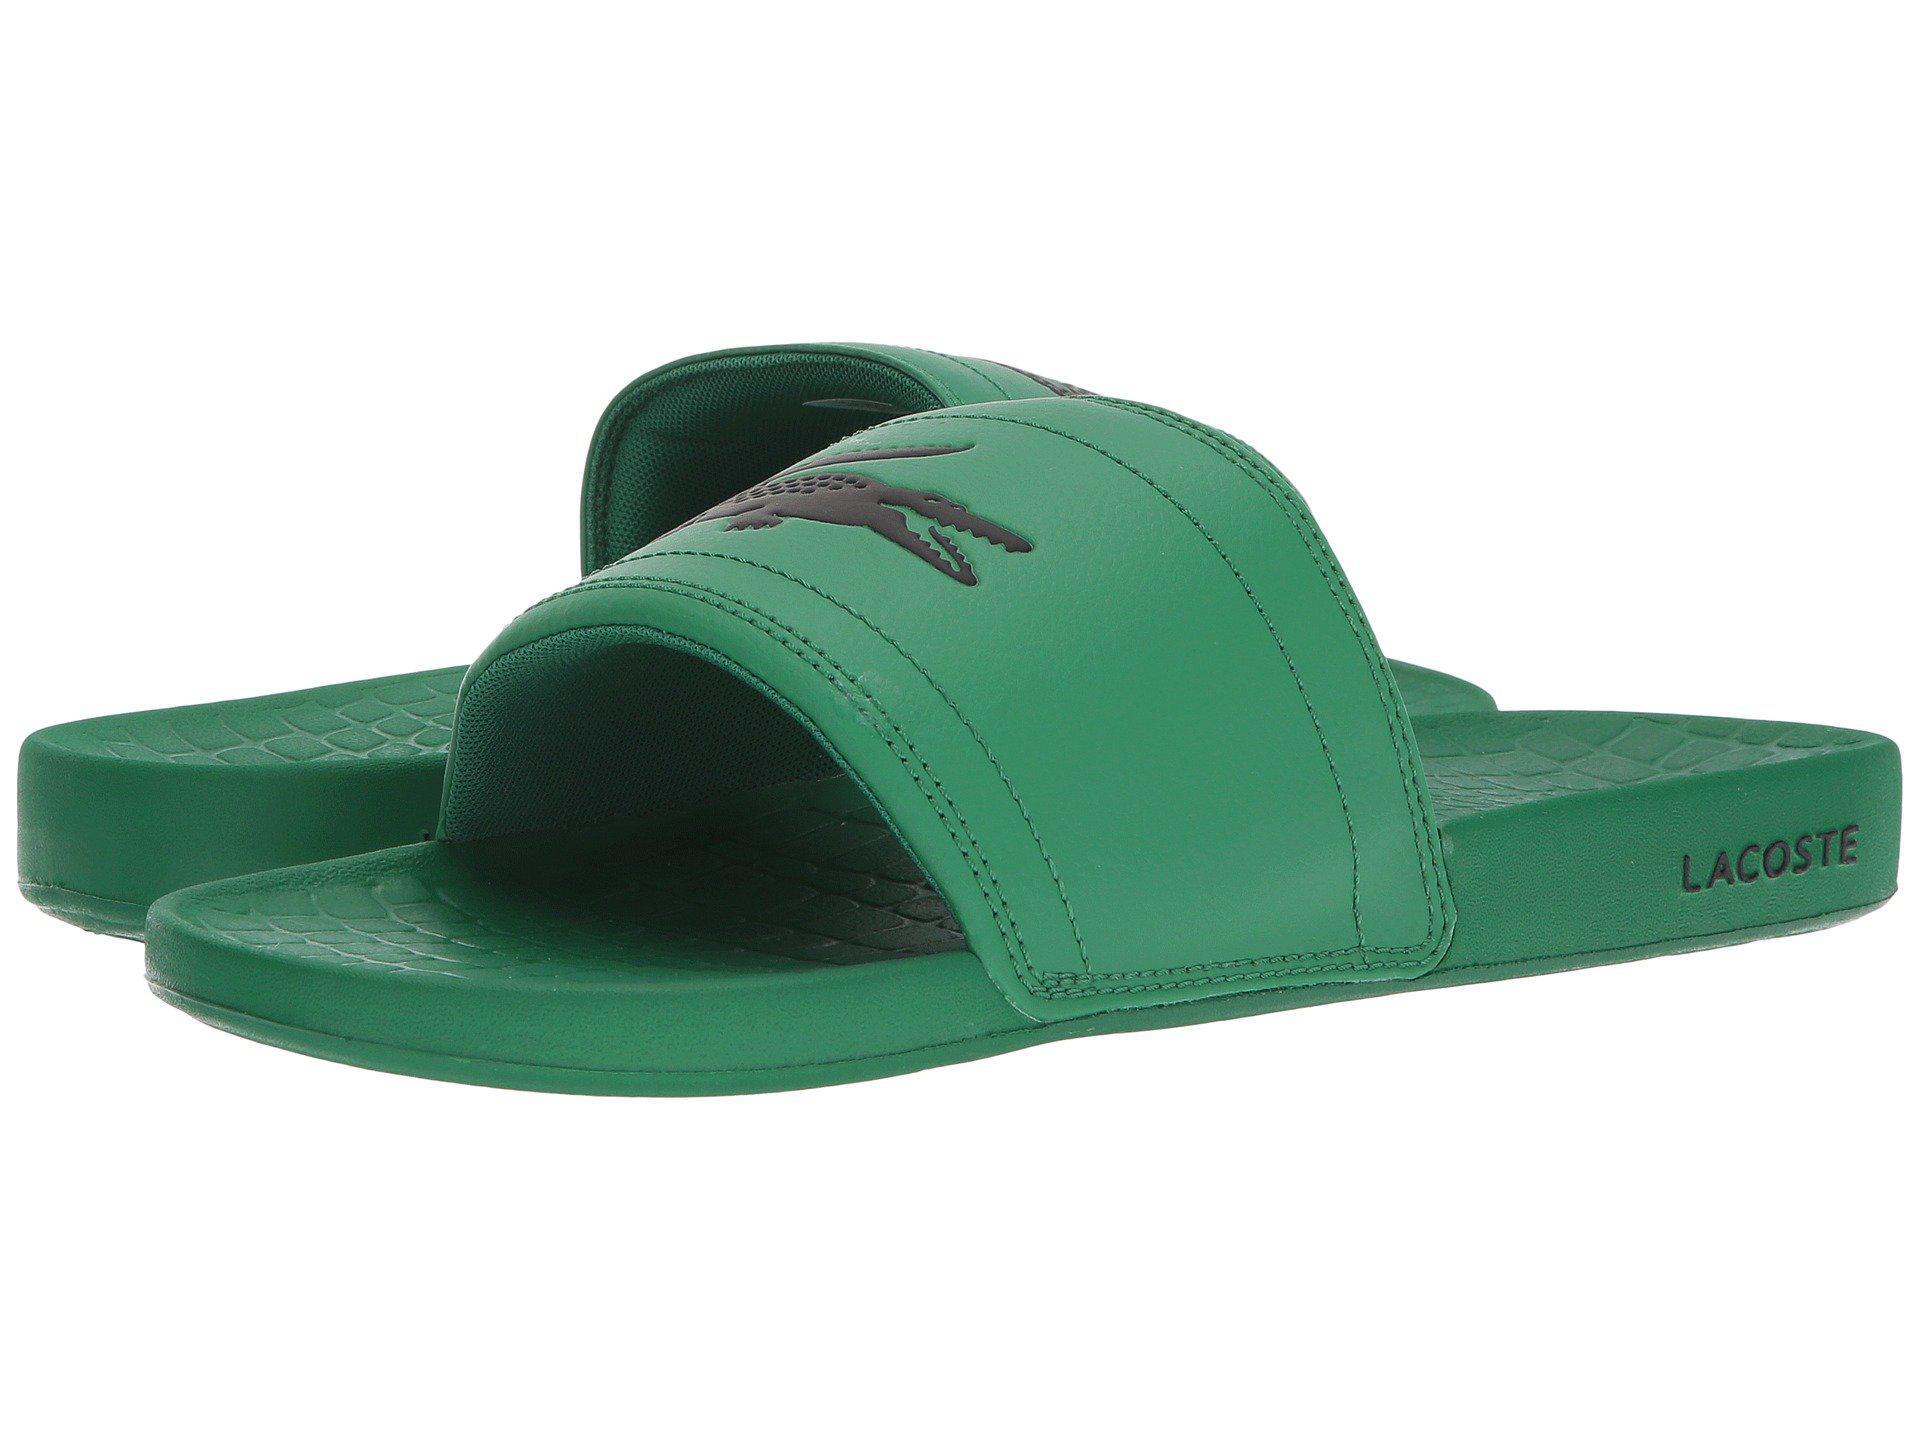 b0b5e1b7a6731 Lyst - Lacoste Fraisier 118 1 Us (green black) Men s Shoes in Green ...